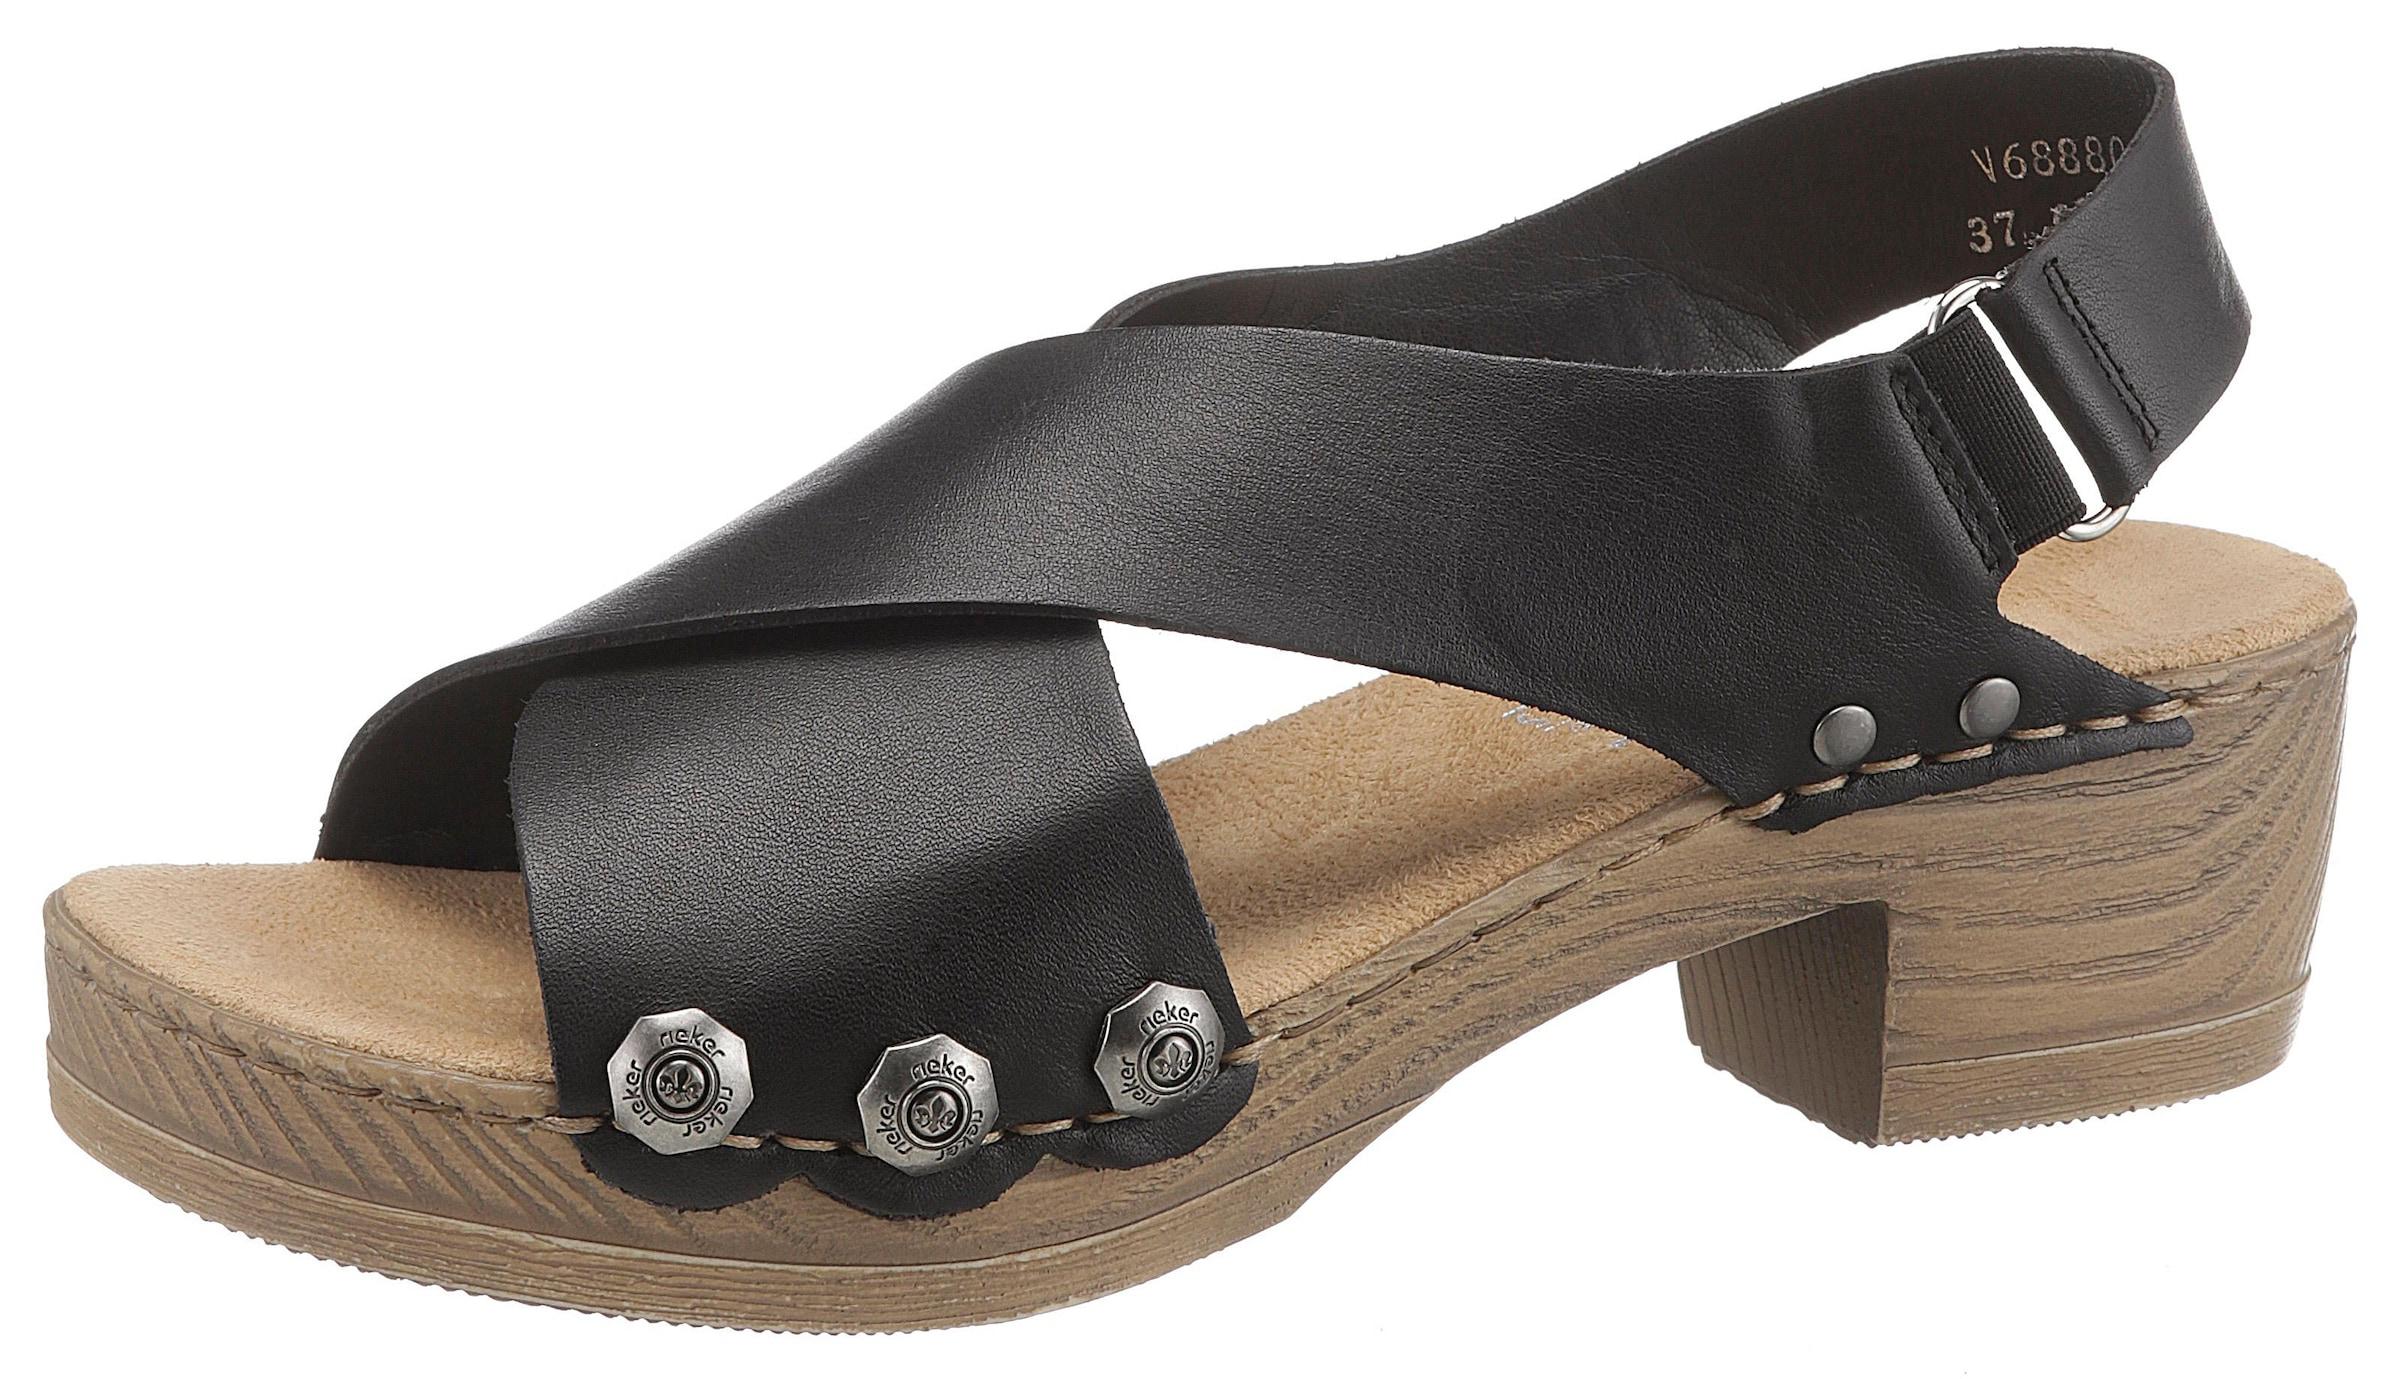 Rieker Sandalette per Rechnung | BAUR